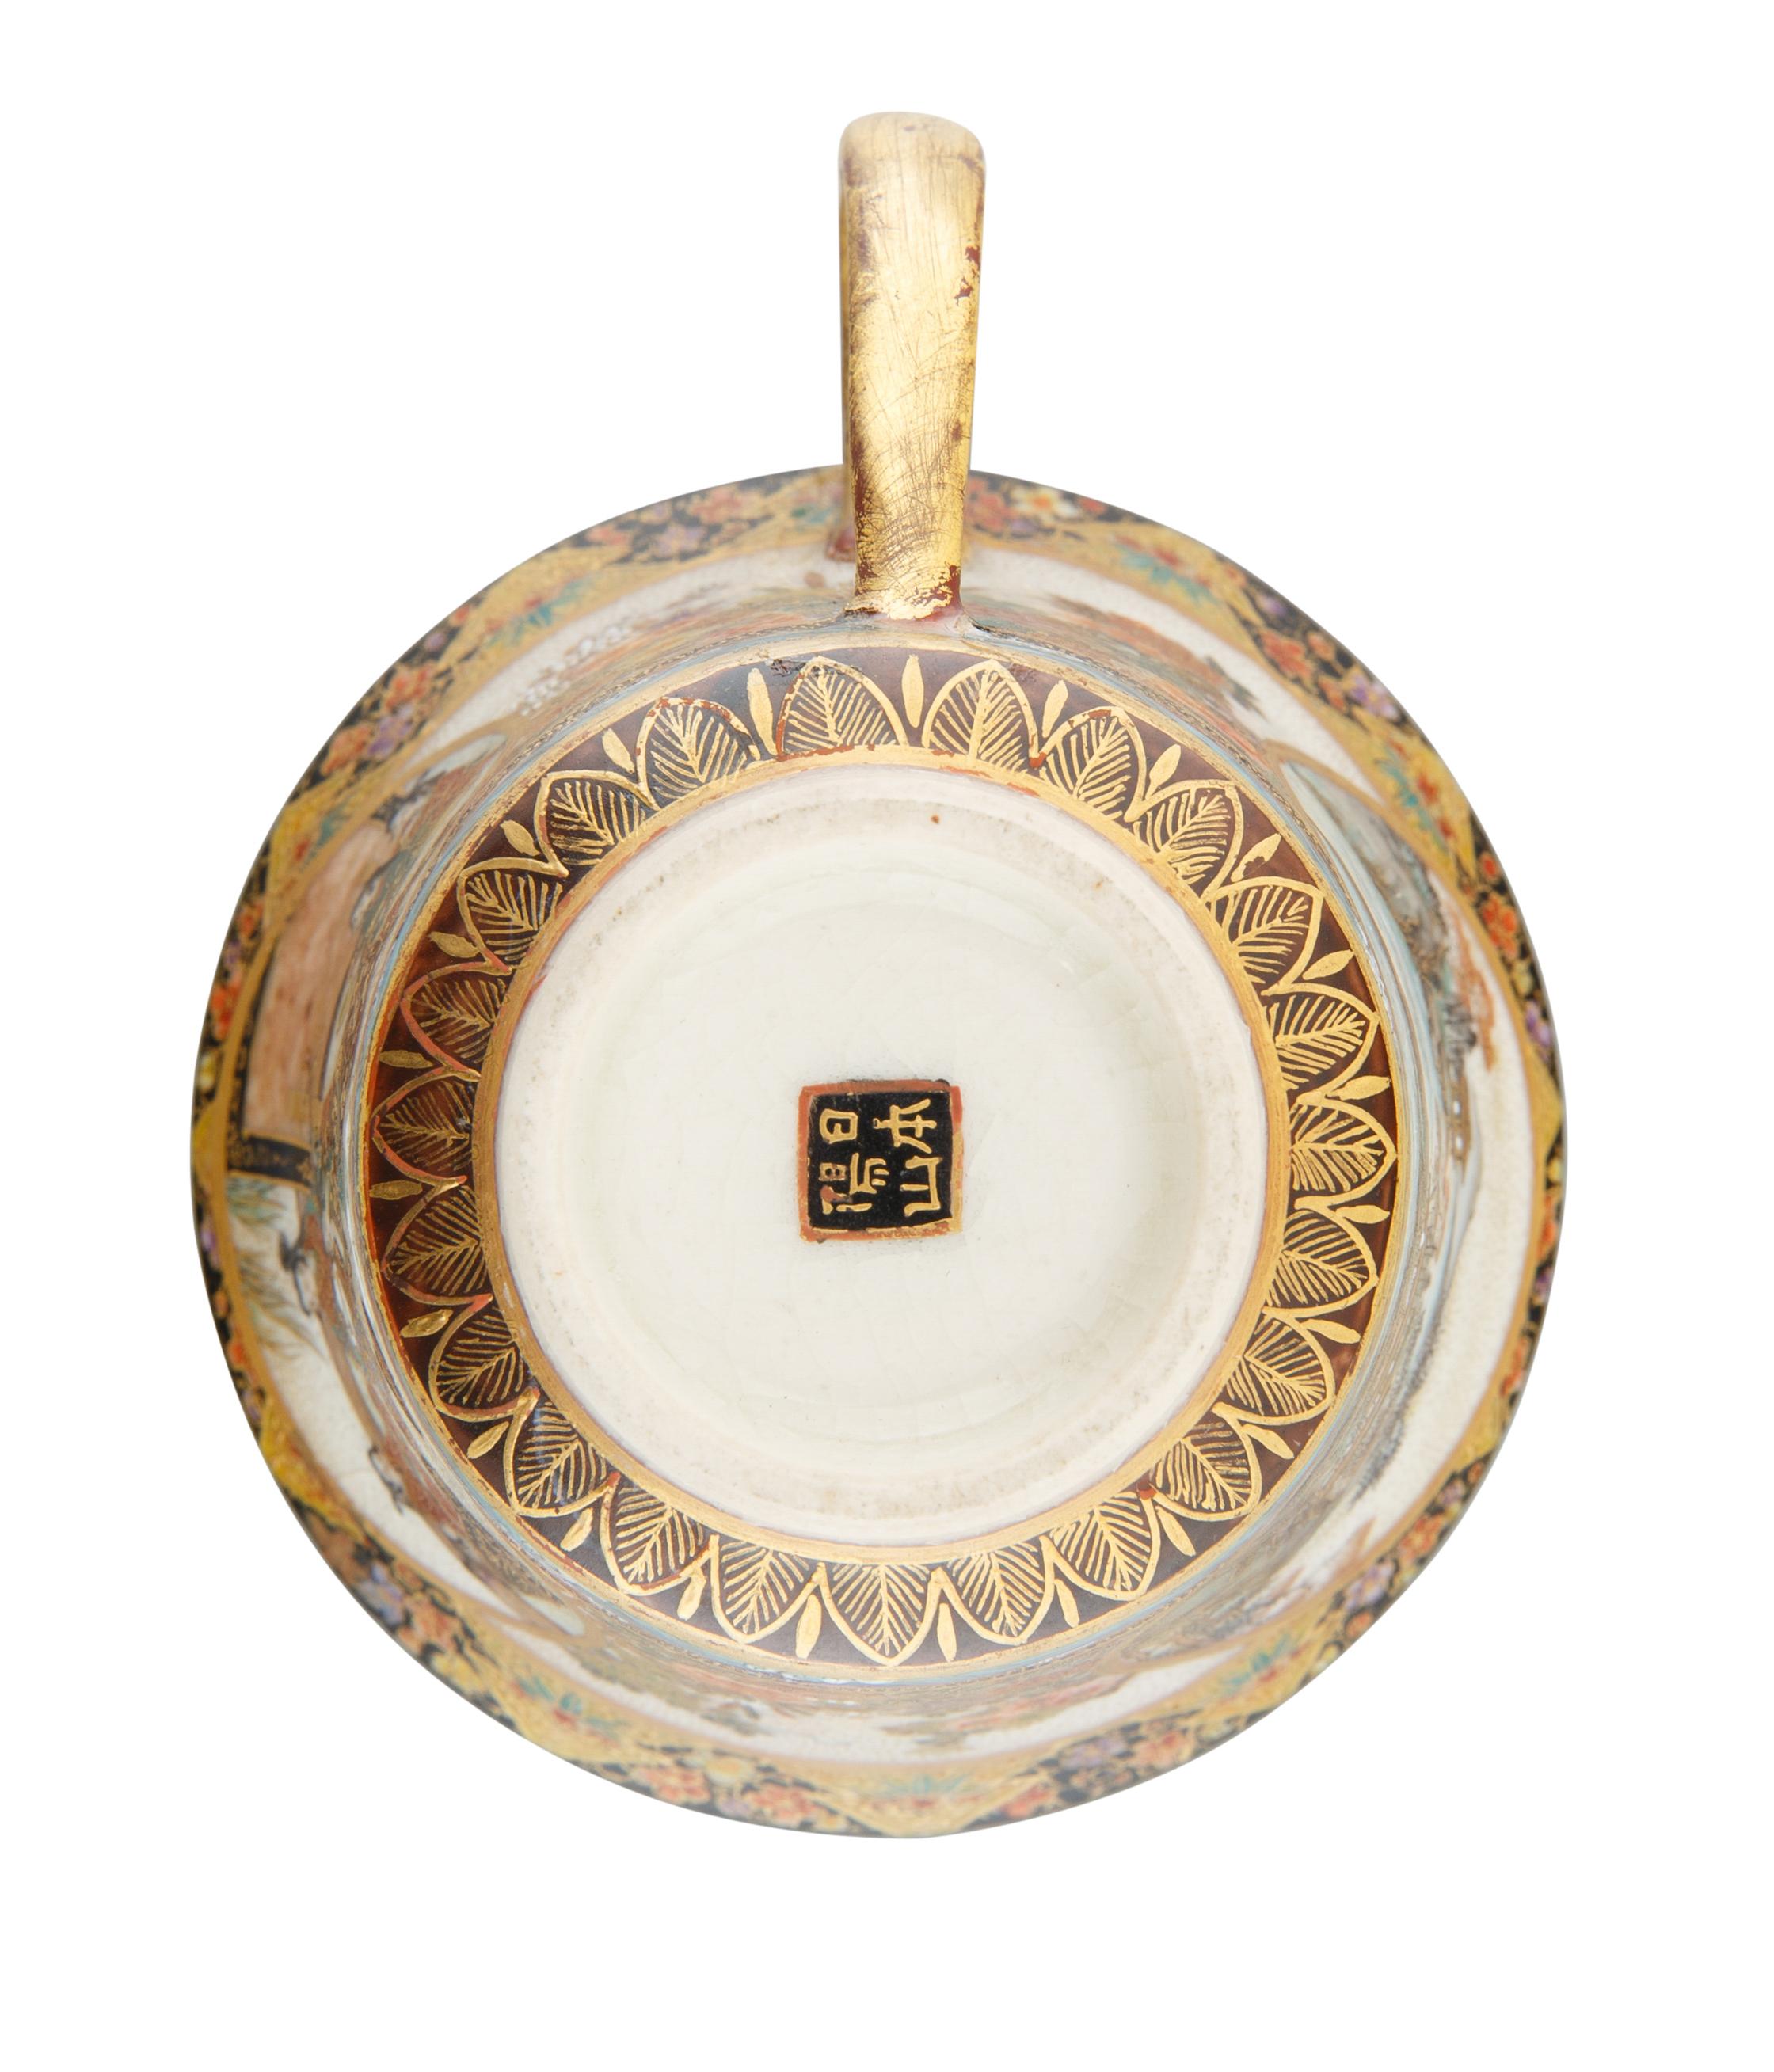 19TH CENTURY SATSUMA PORCELAIN TEA CUP AND SAUCER - Image 4 of 7